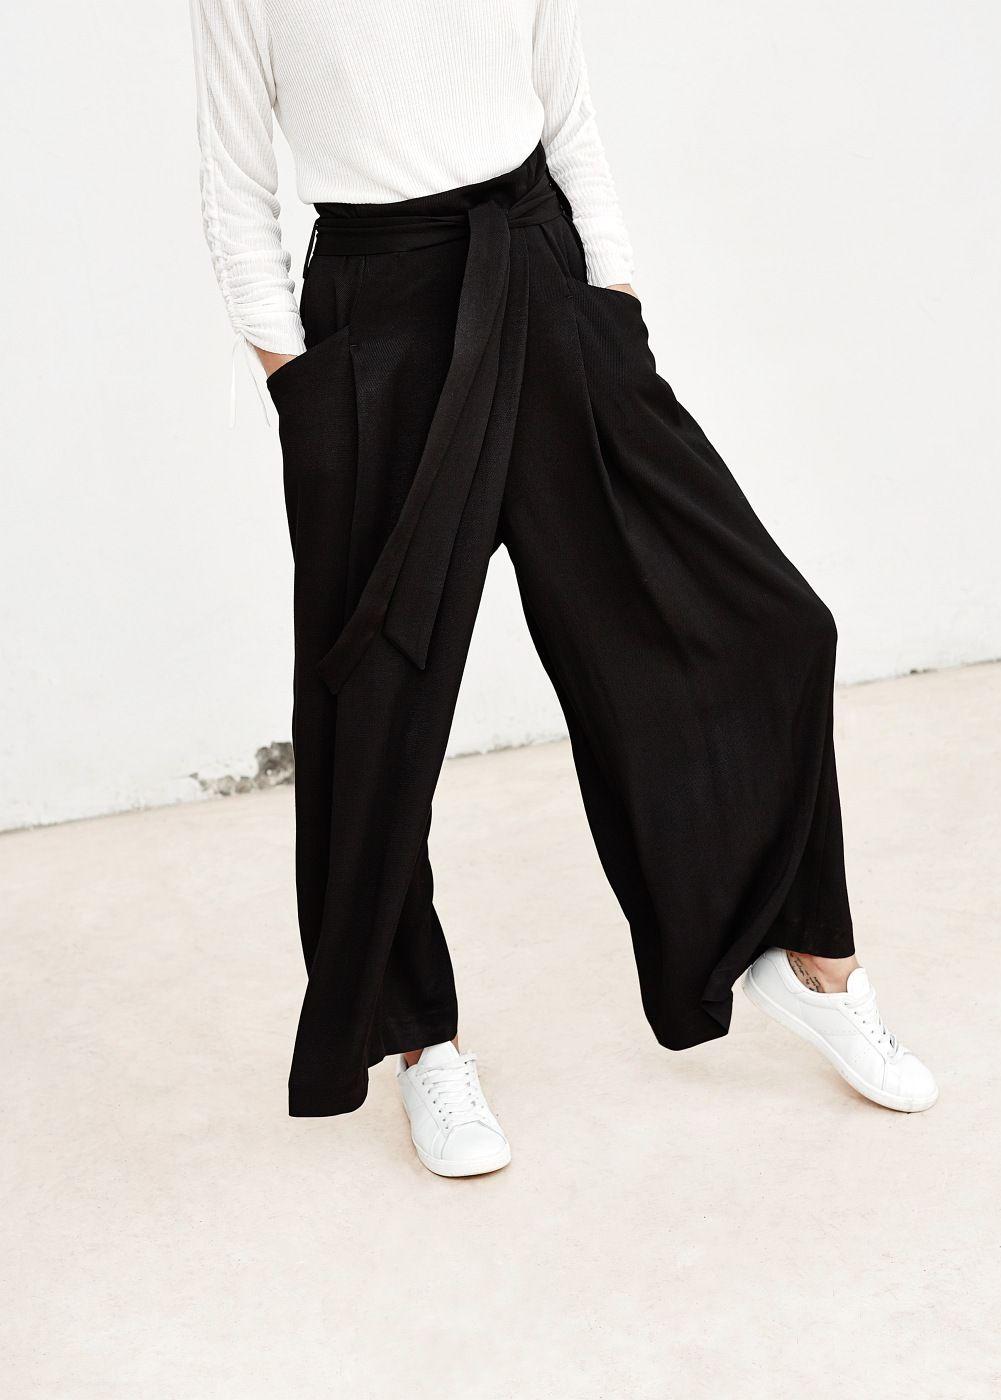 Premium - pantalón palazzo capri - Mujer  d80f81f5e067